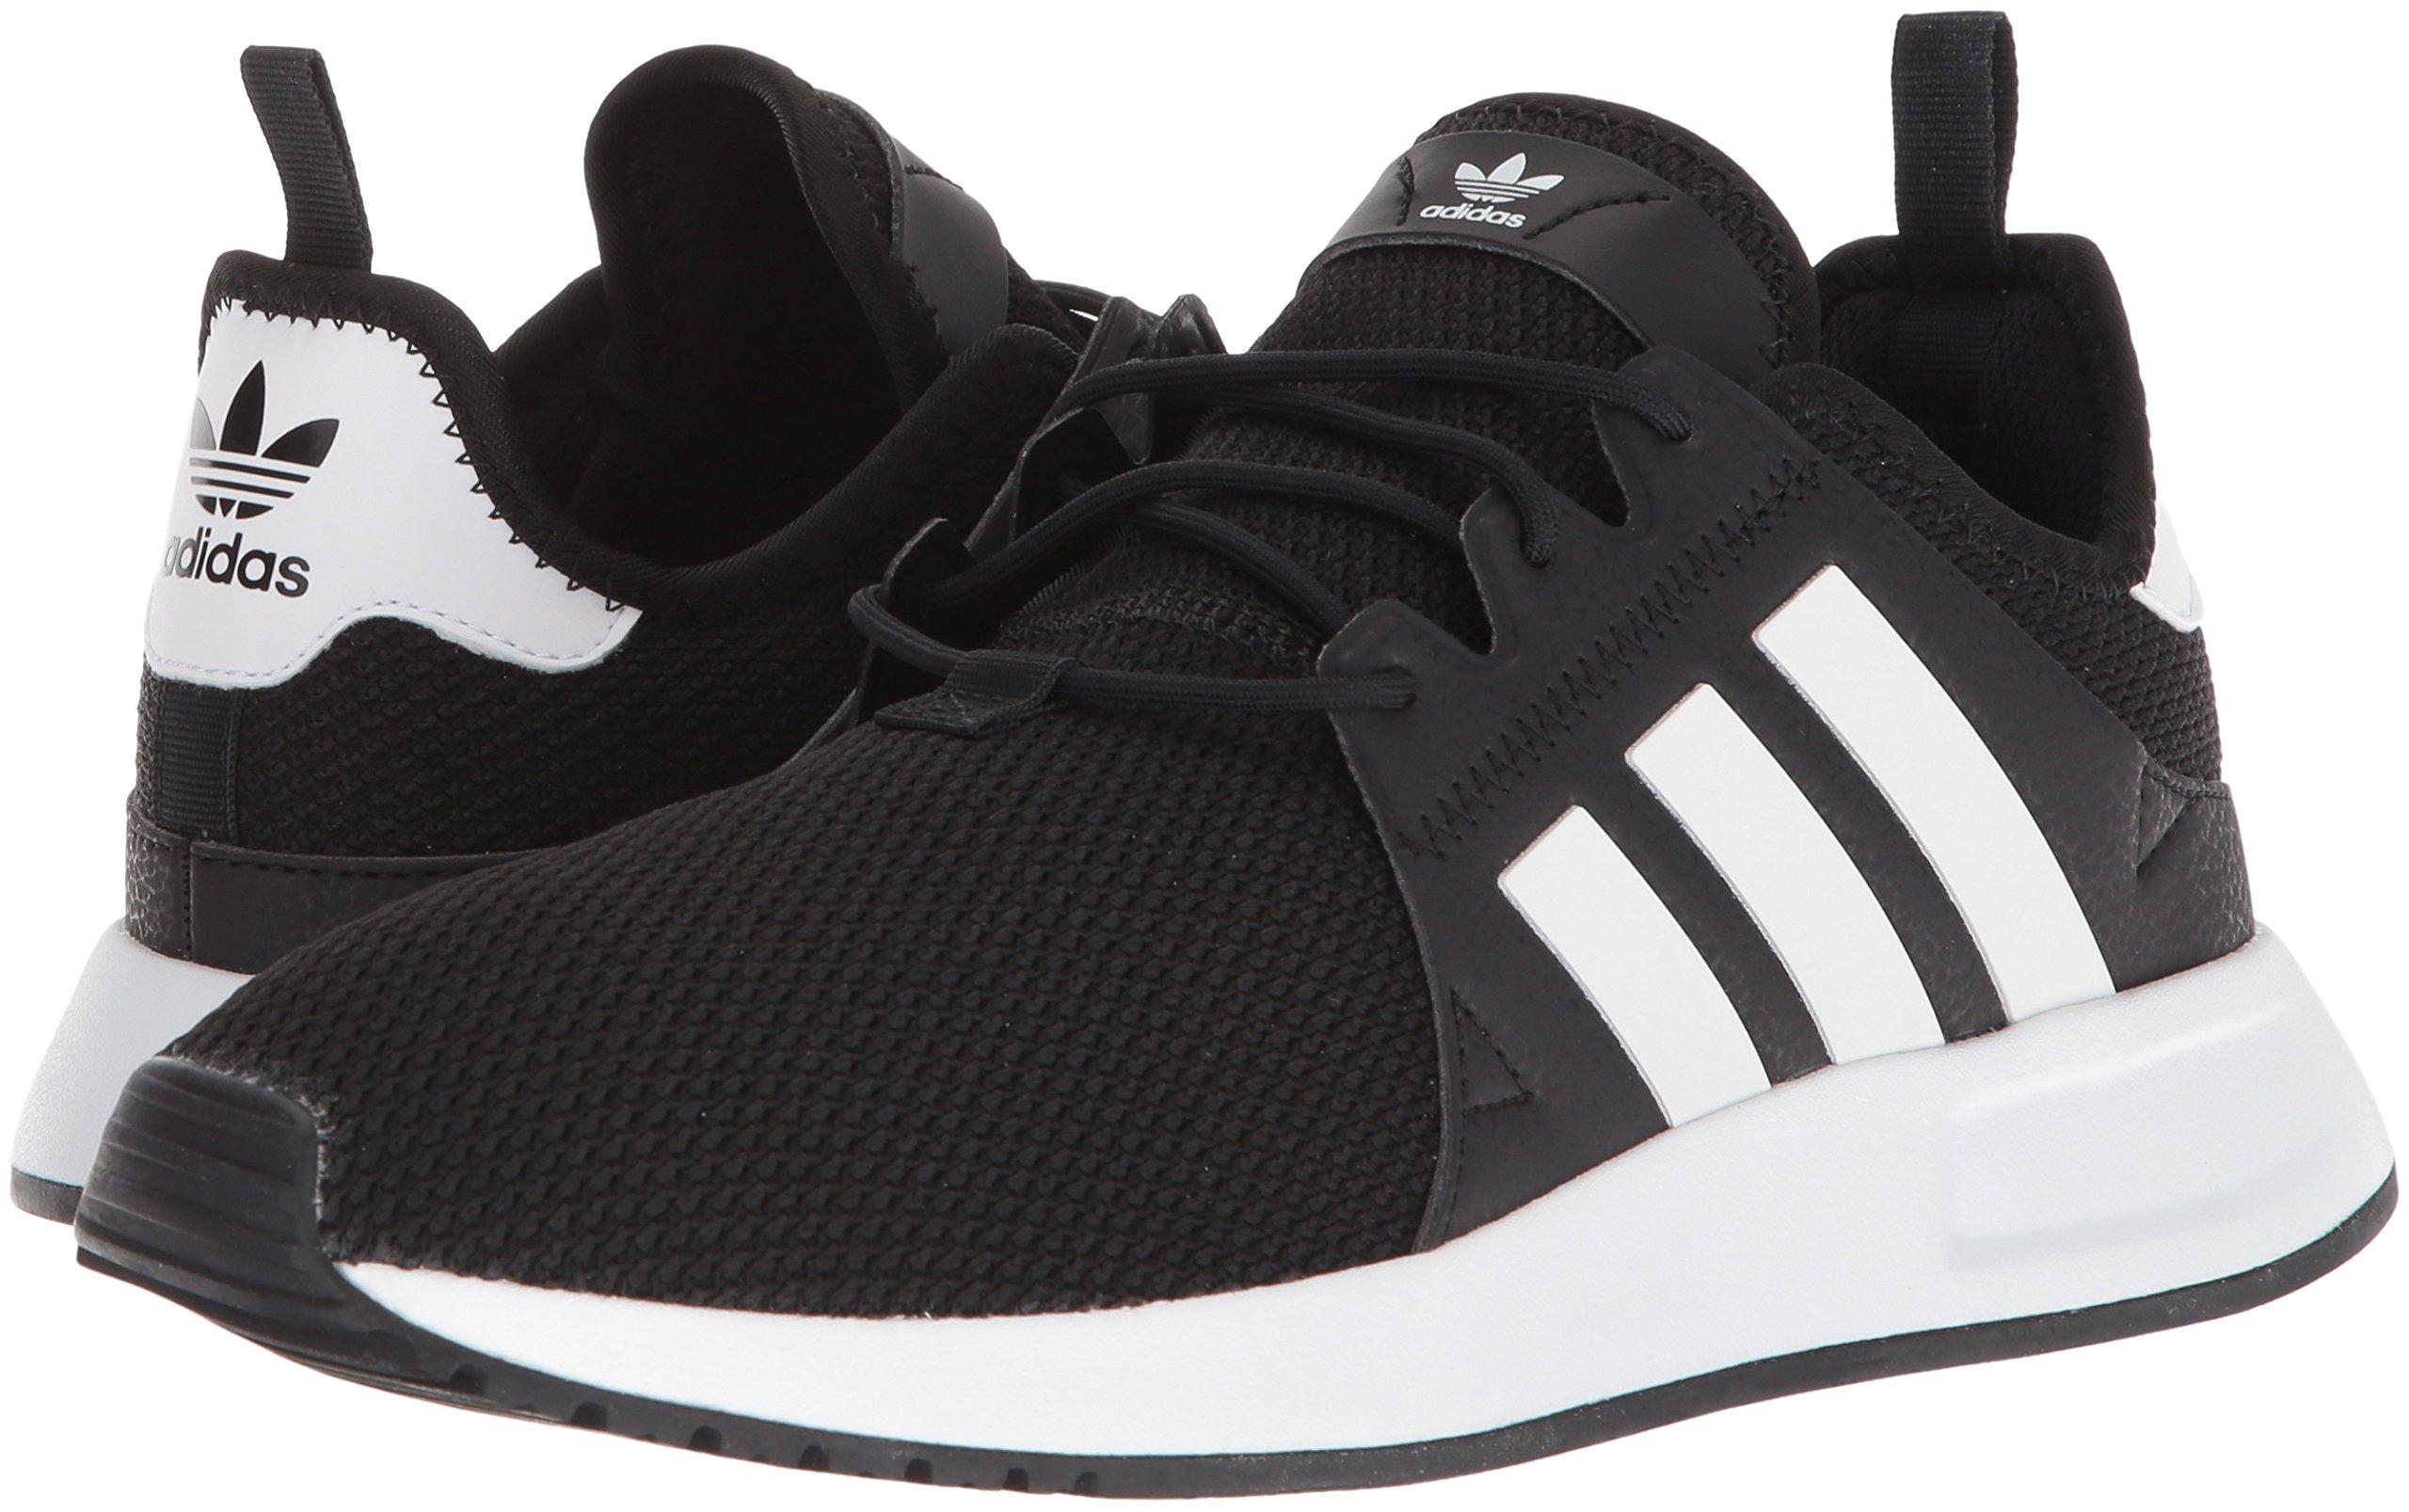 adidas Originals Mens X_PLR Running Shoe White/Black, 4.5 M US by adidas Originals (Image #6)